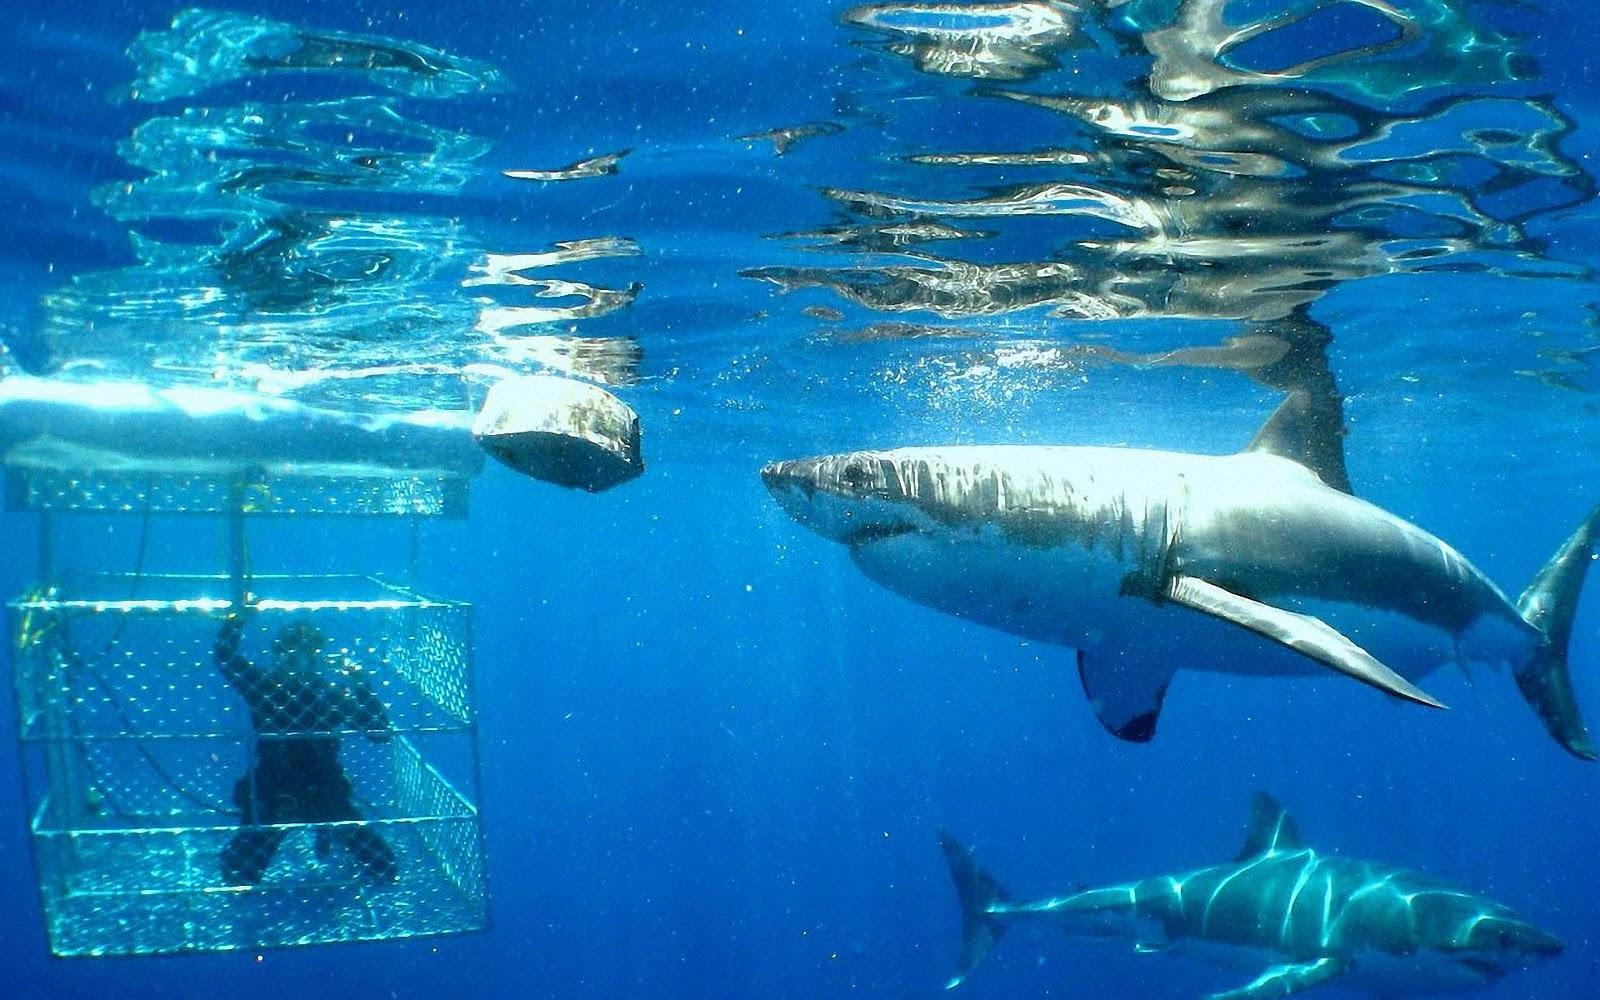 Animal pictures sharks wallpapers hd psuperos shark wallpaper 8jpg 1600x1000